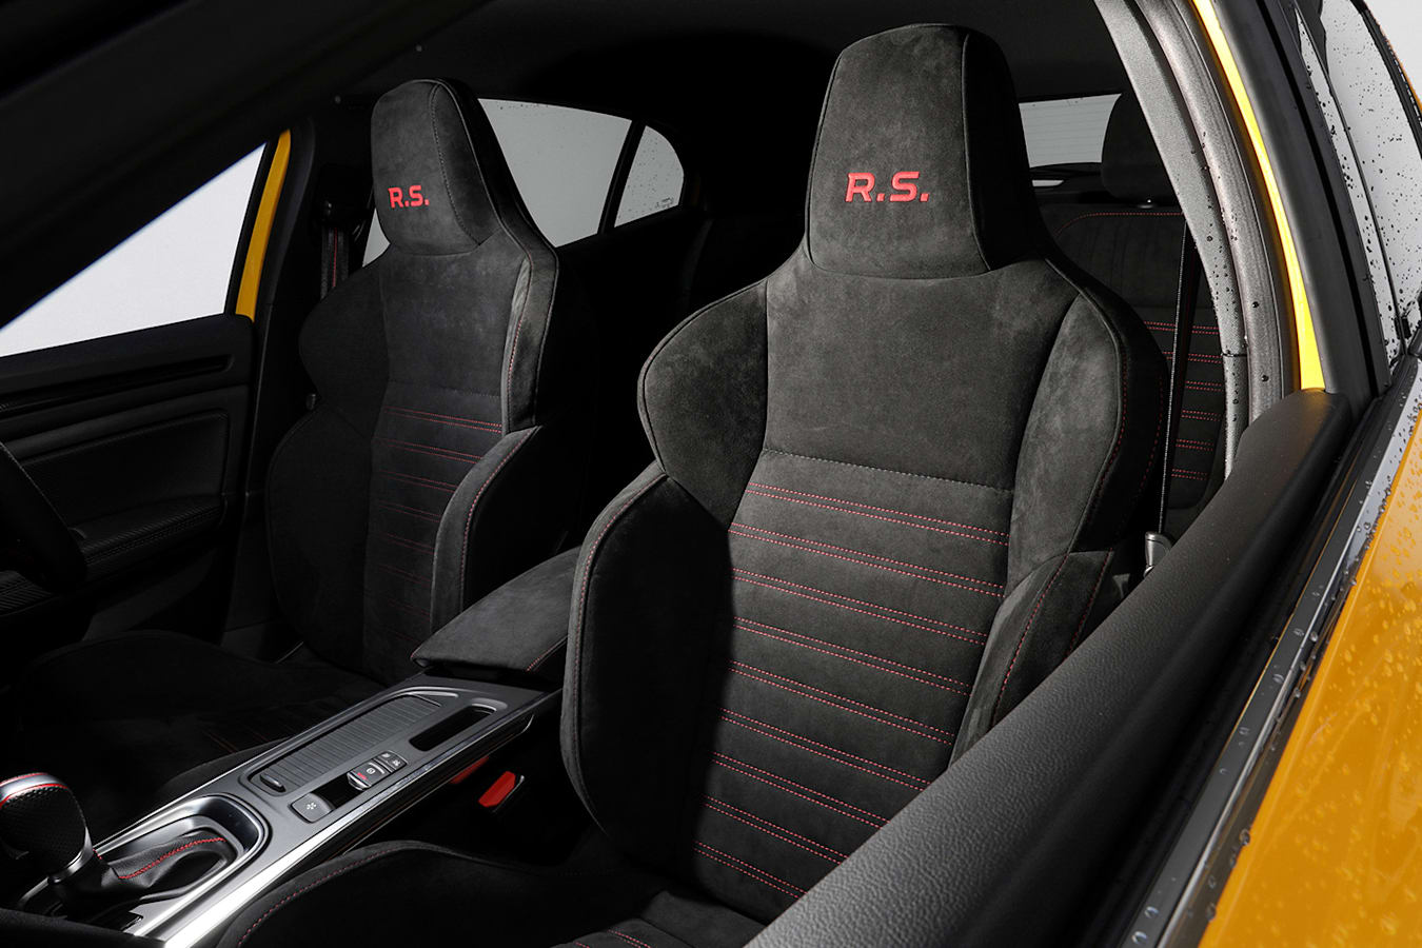 Renault Megane Rs Seats Jpg